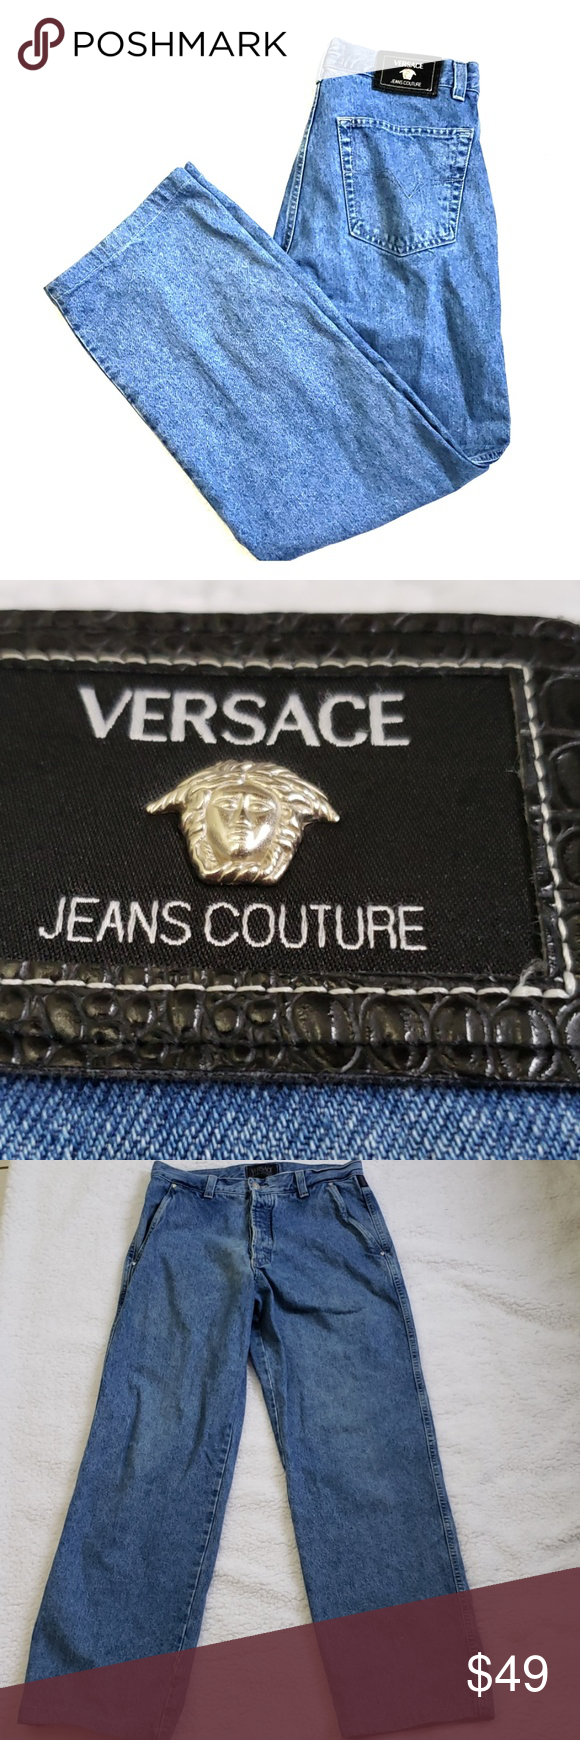 Versace Mom Jeans Couture Ittierre 34 48 Vtg Versace Jeans Couture Versace Vintage Versace